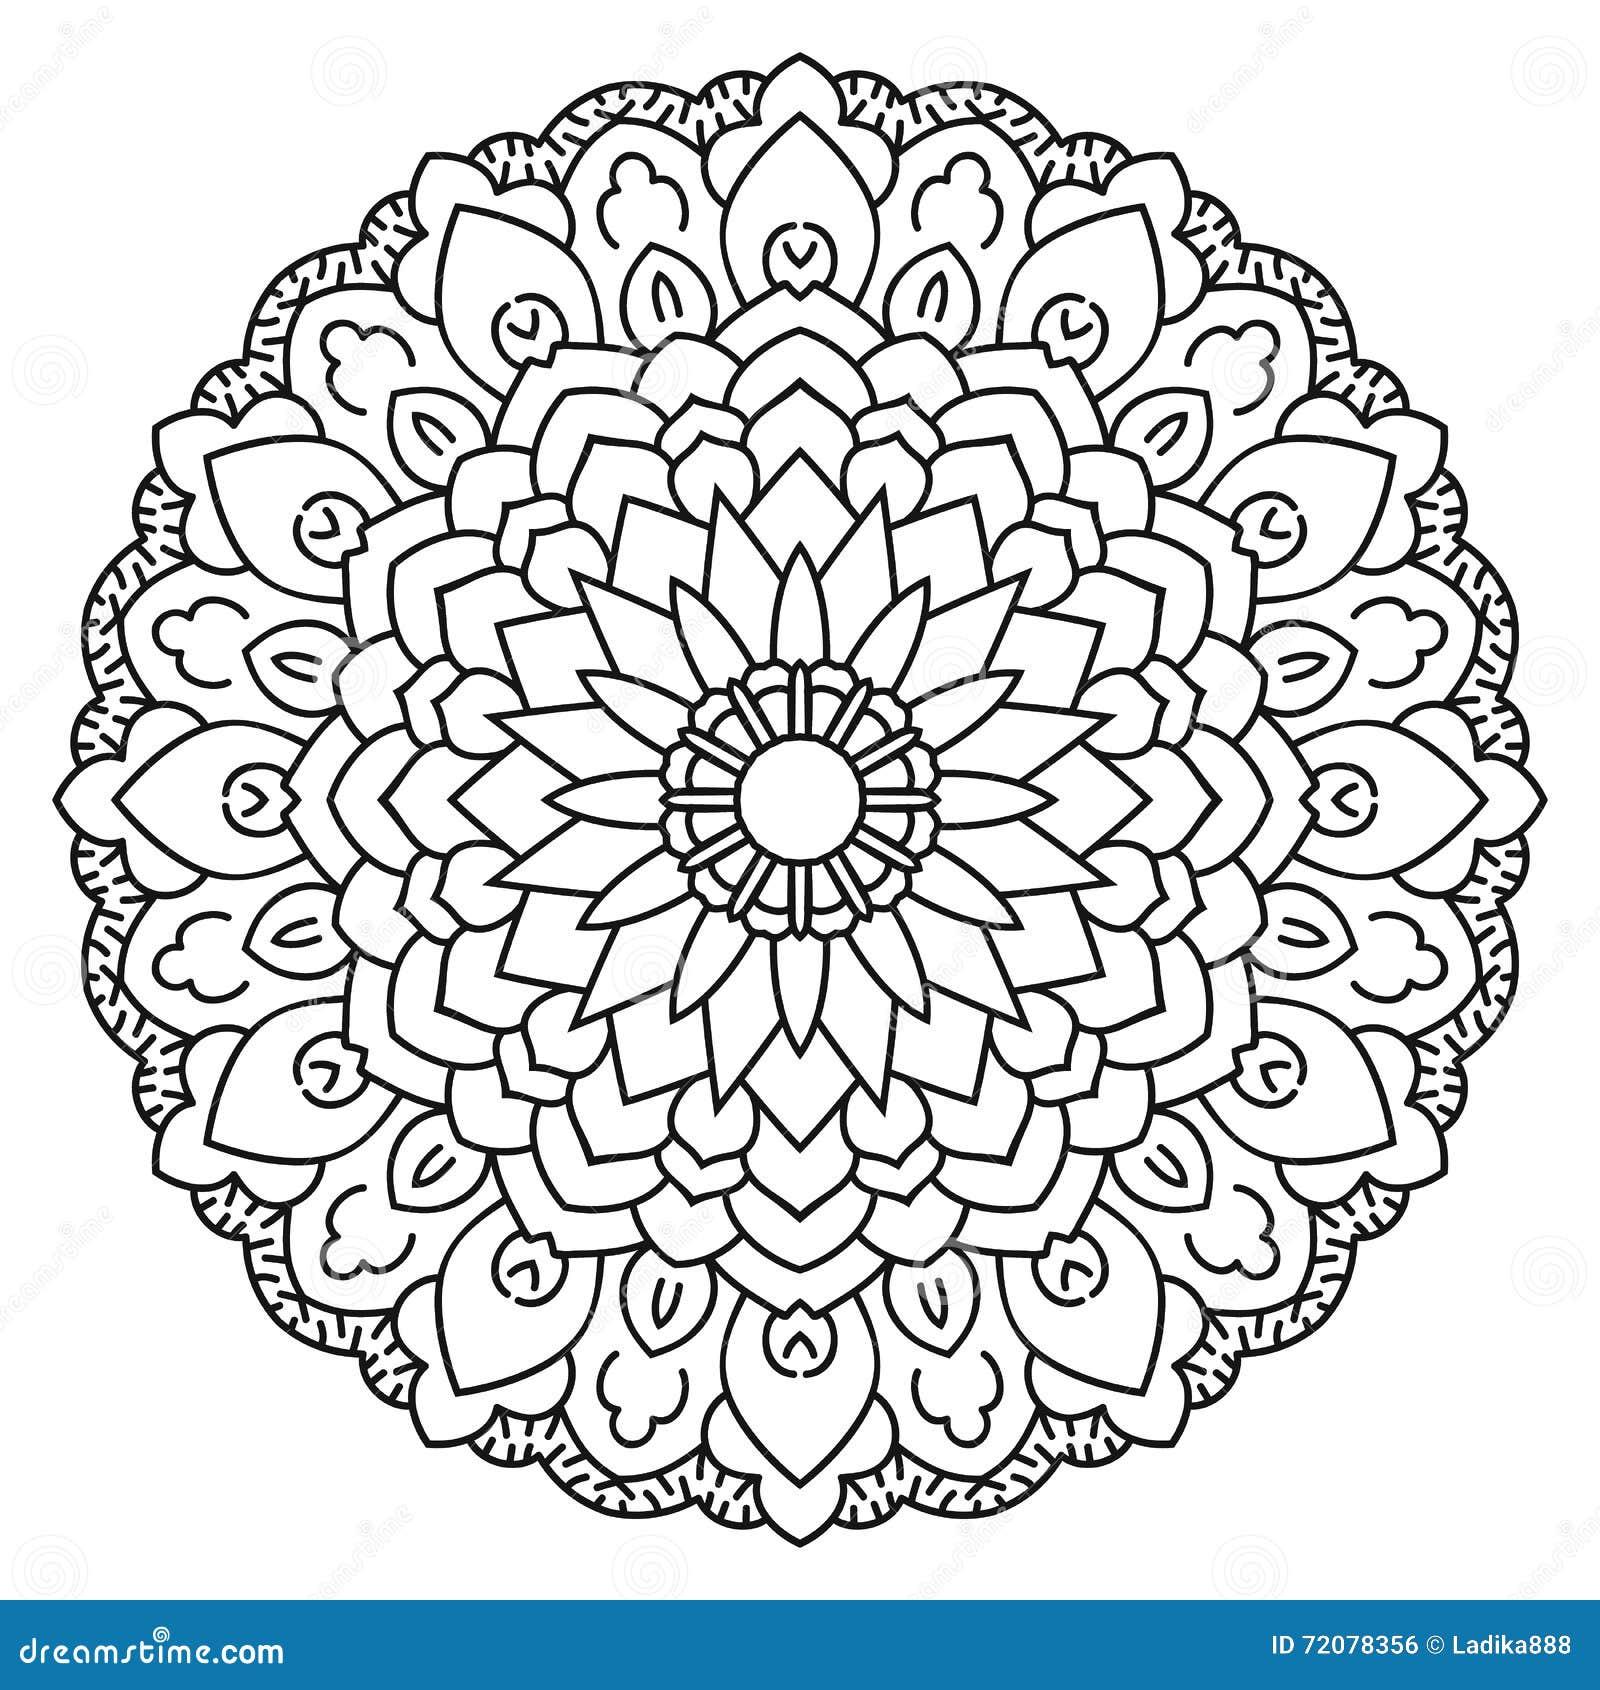 Symmetrical Circular Pattern Mandala Stock Vector Illustration Of - Circle-pattern-coloring-pages